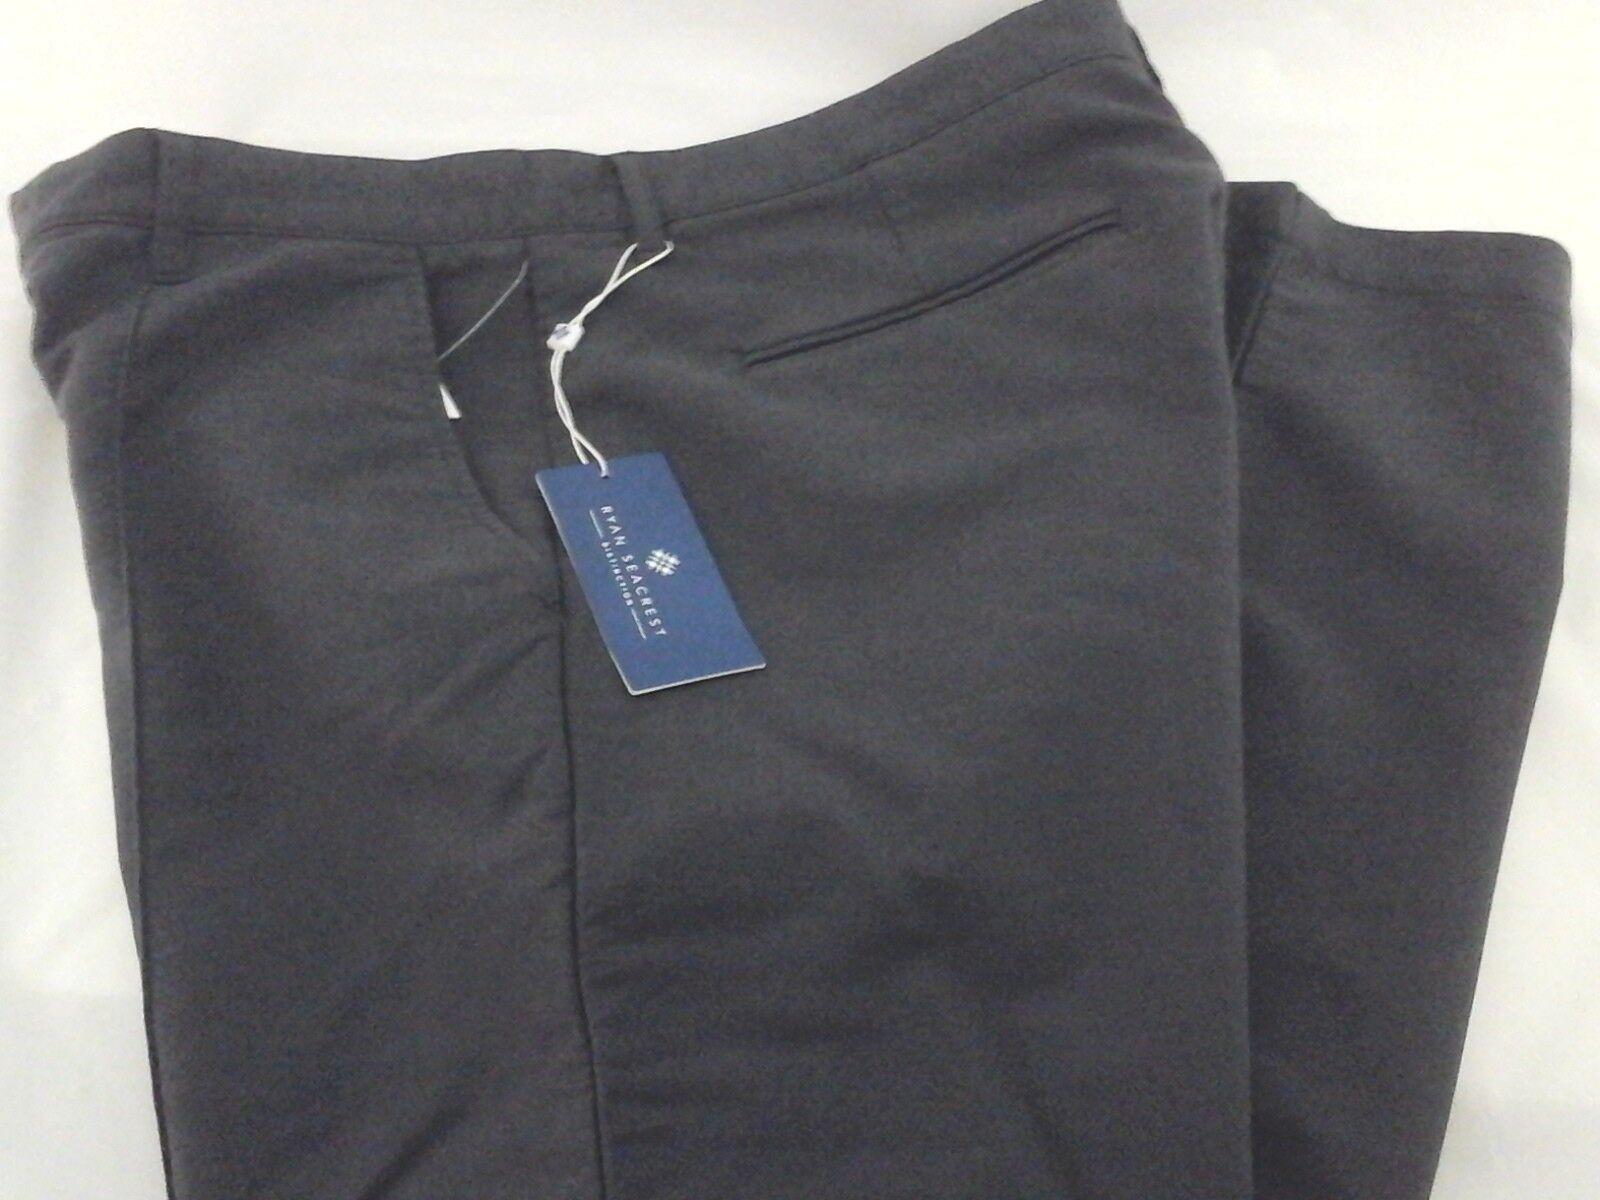 RYAN SEACREST Distinction Pants Textured Front Seam Grey Stretch Modern Mens